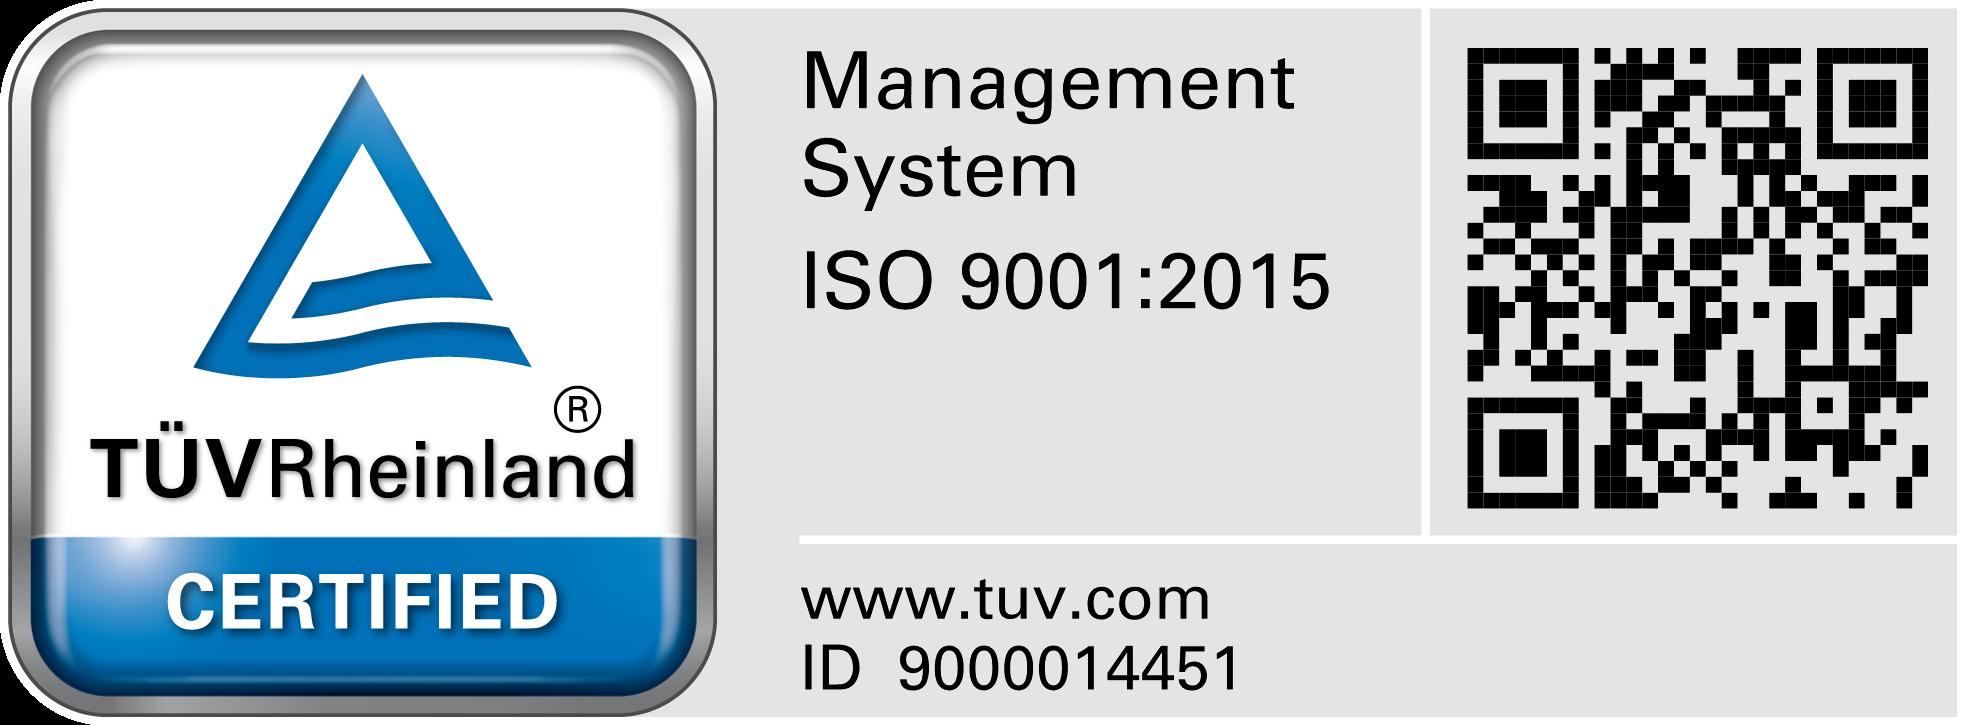 TR-Testmark_9000014451_EN_CMYK_with-QR-Code.png